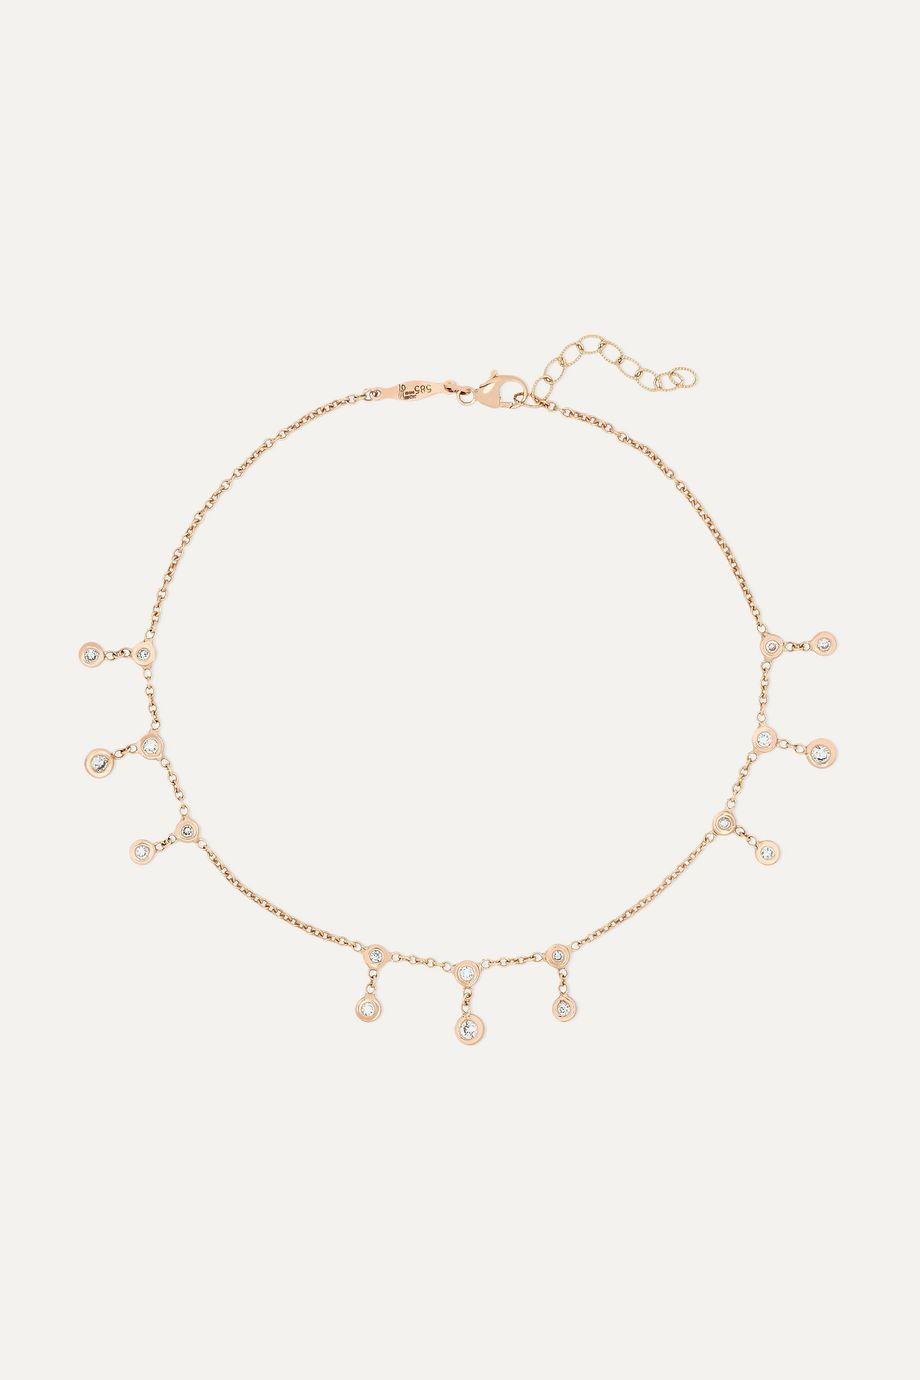 Jacquie Aiche Shaker 14-karat rose gold diamond anklet